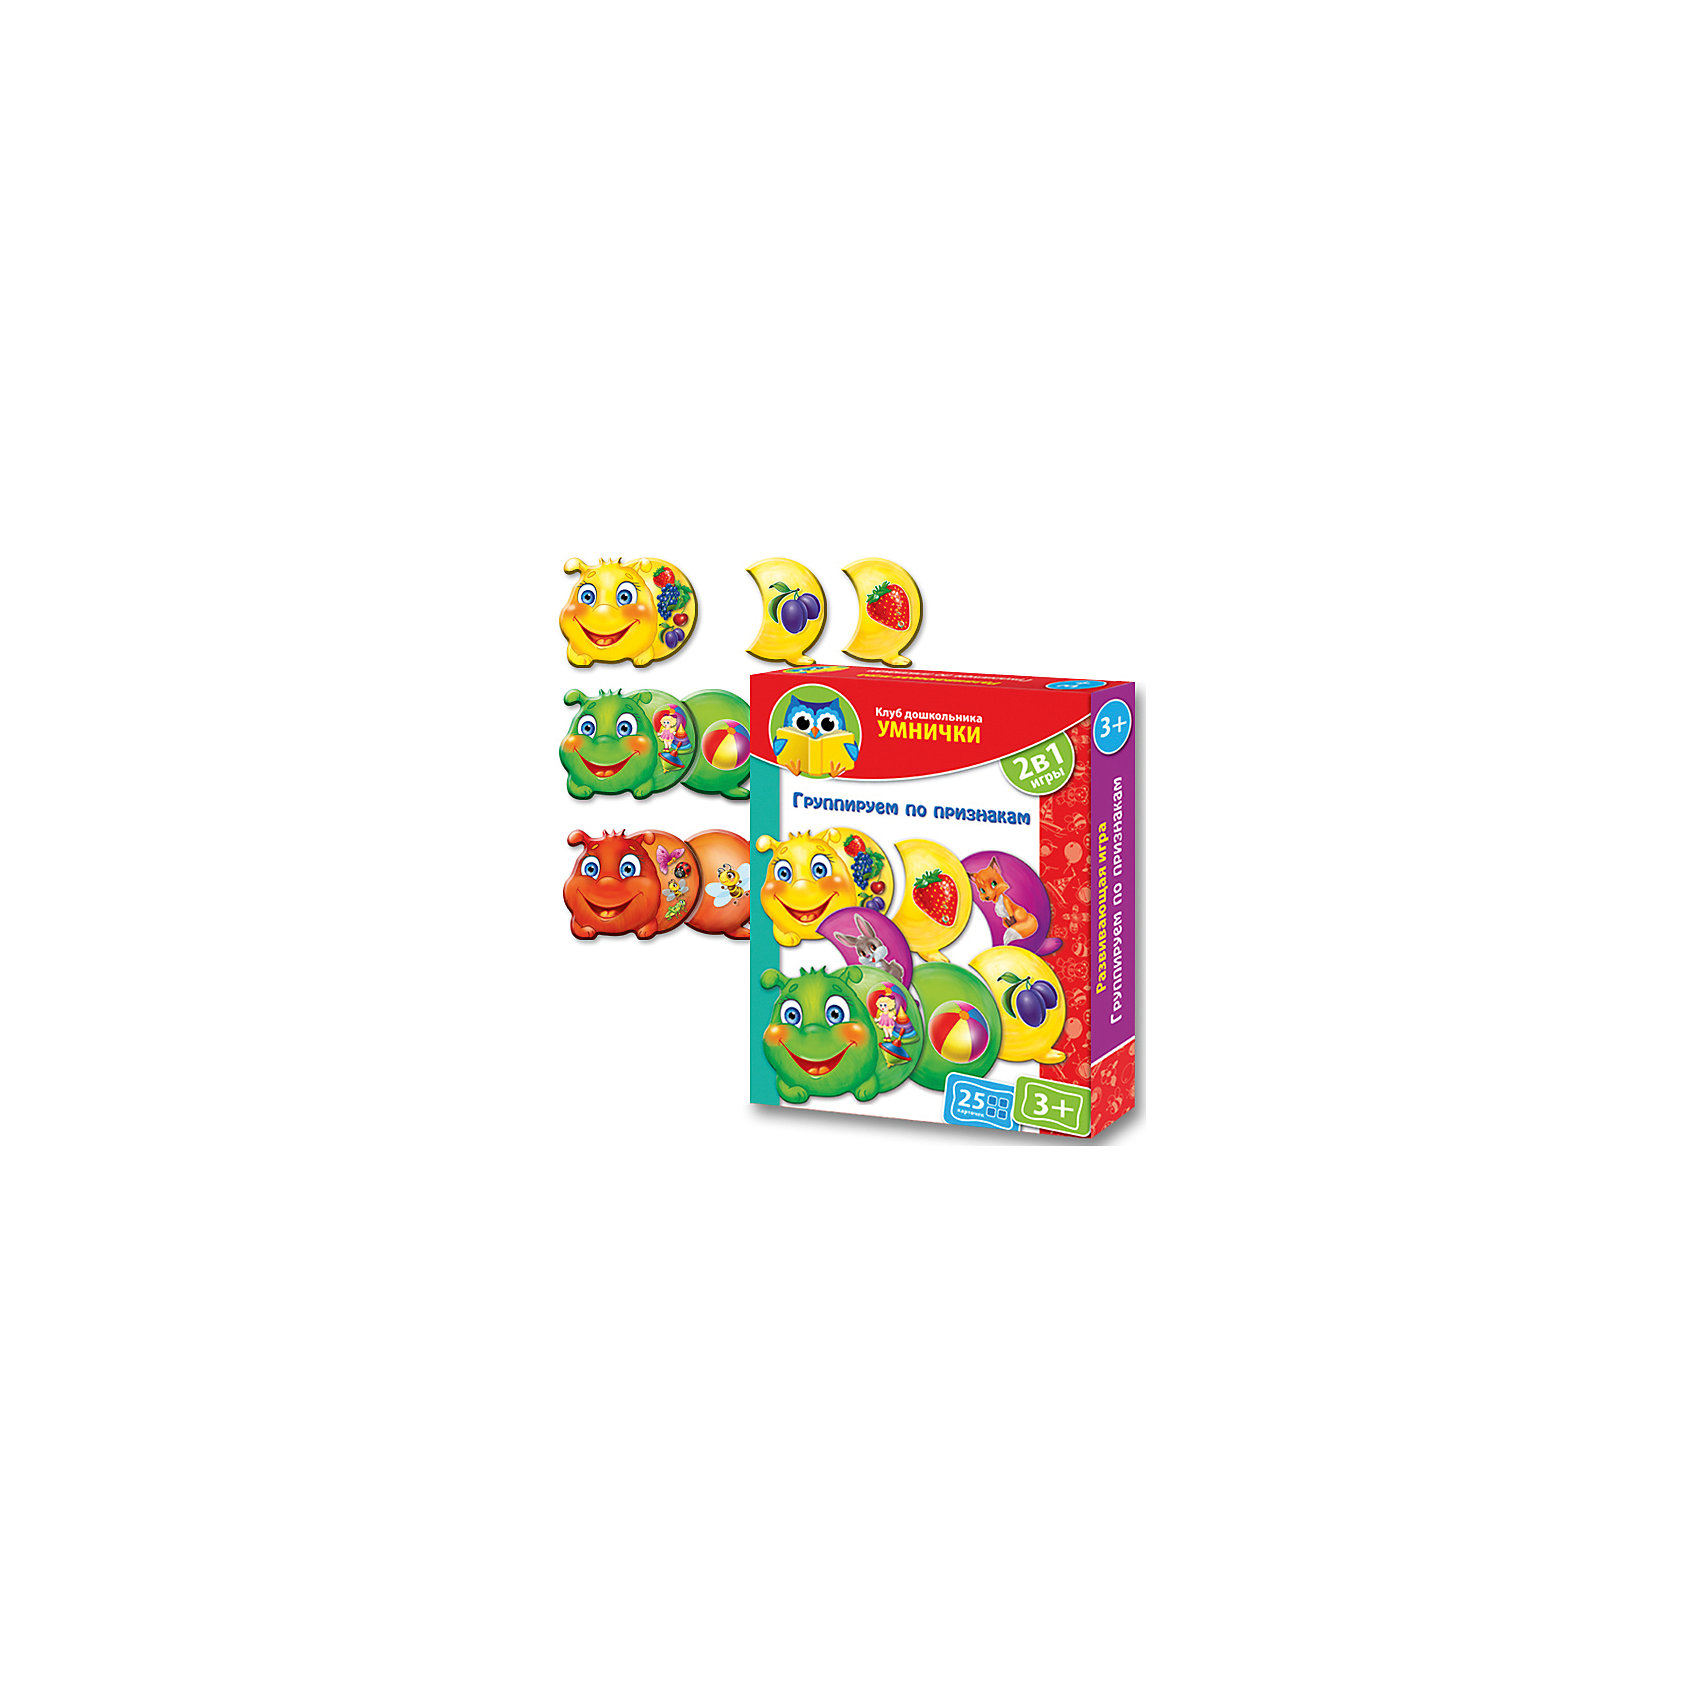 Vladi Toys Игра Группируем по признакам, Vladi Toys